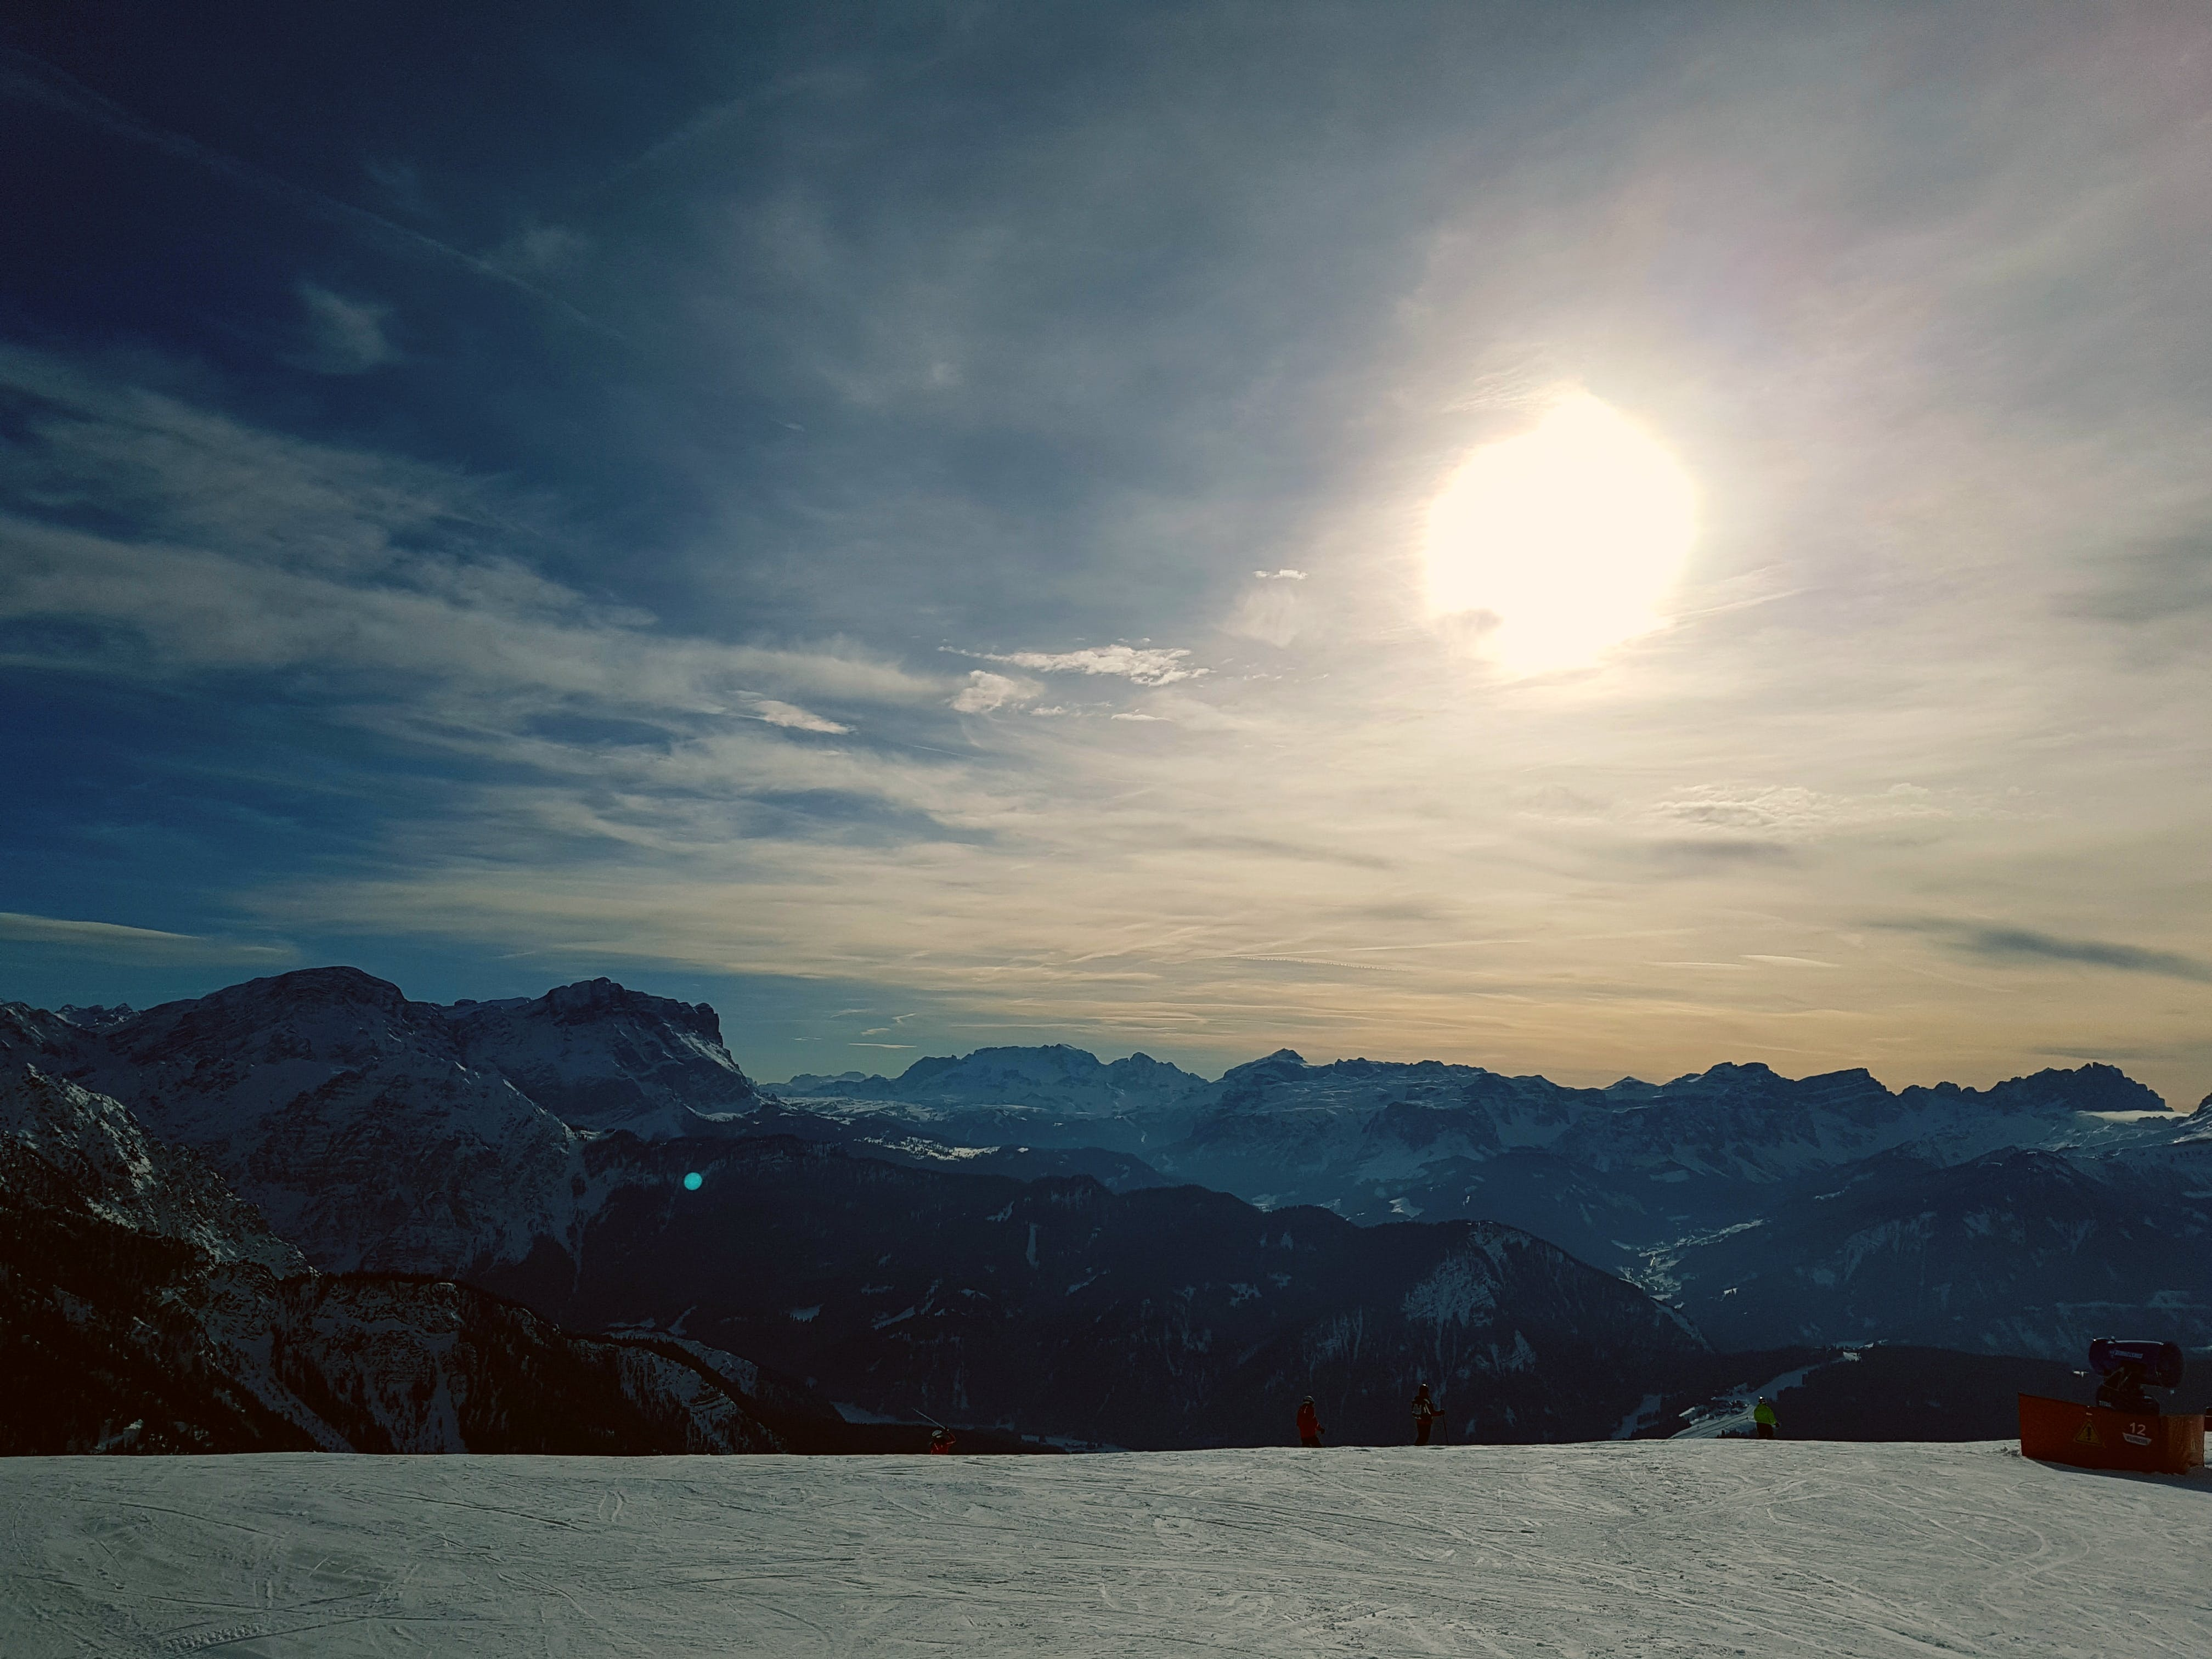 Gratis lagerfoto af bjerg, bjerge, ferie, gratis baggrund